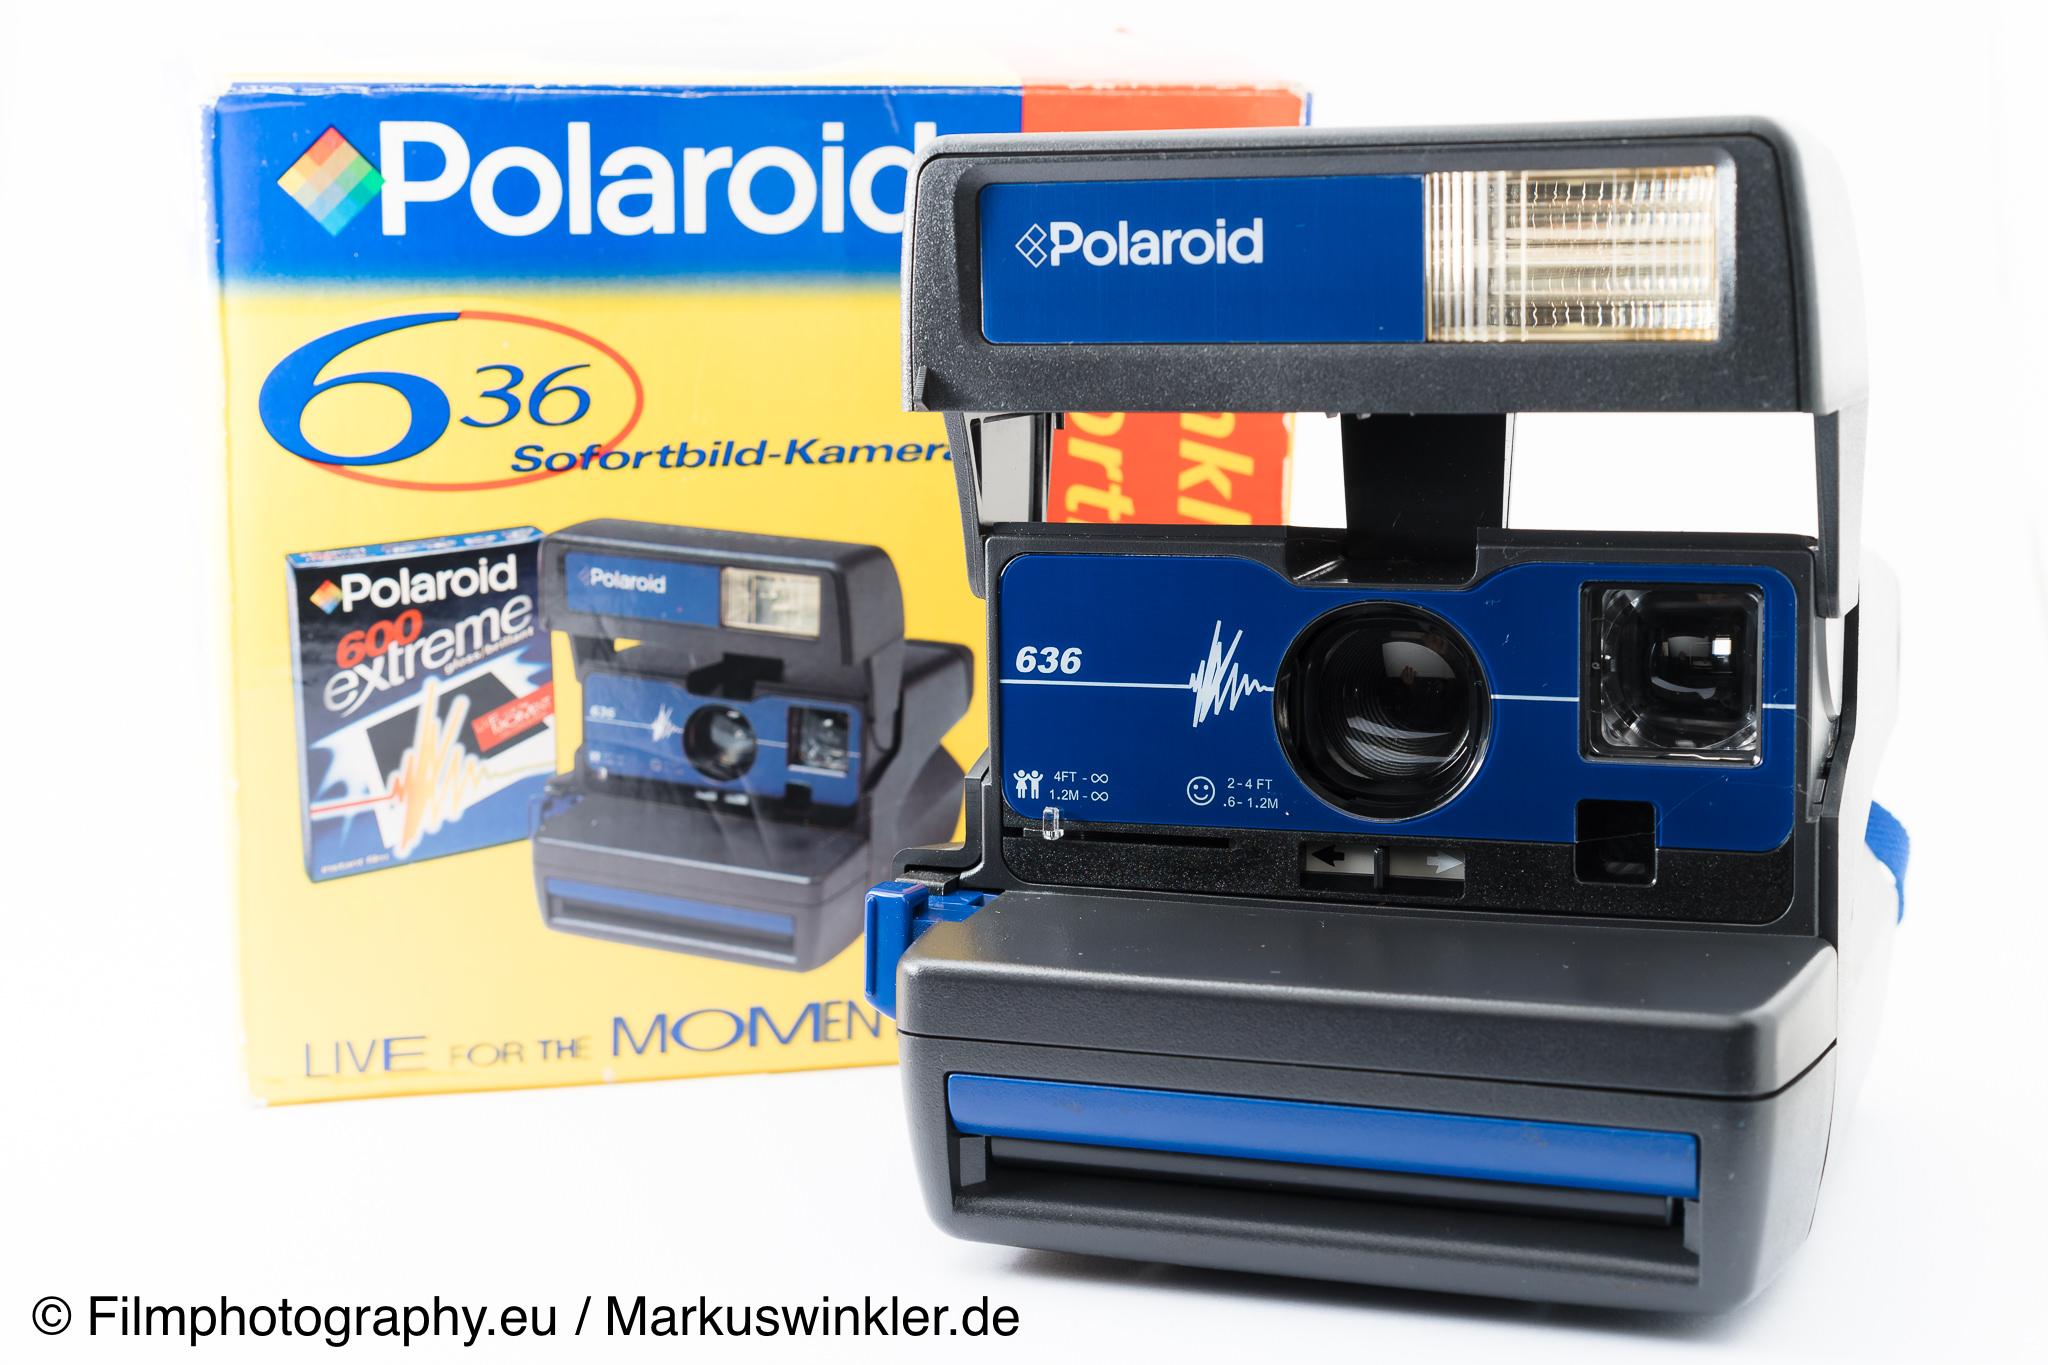 polaroid 636 sofortbildkamera. Black Bedroom Furniture Sets. Home Design Ideas